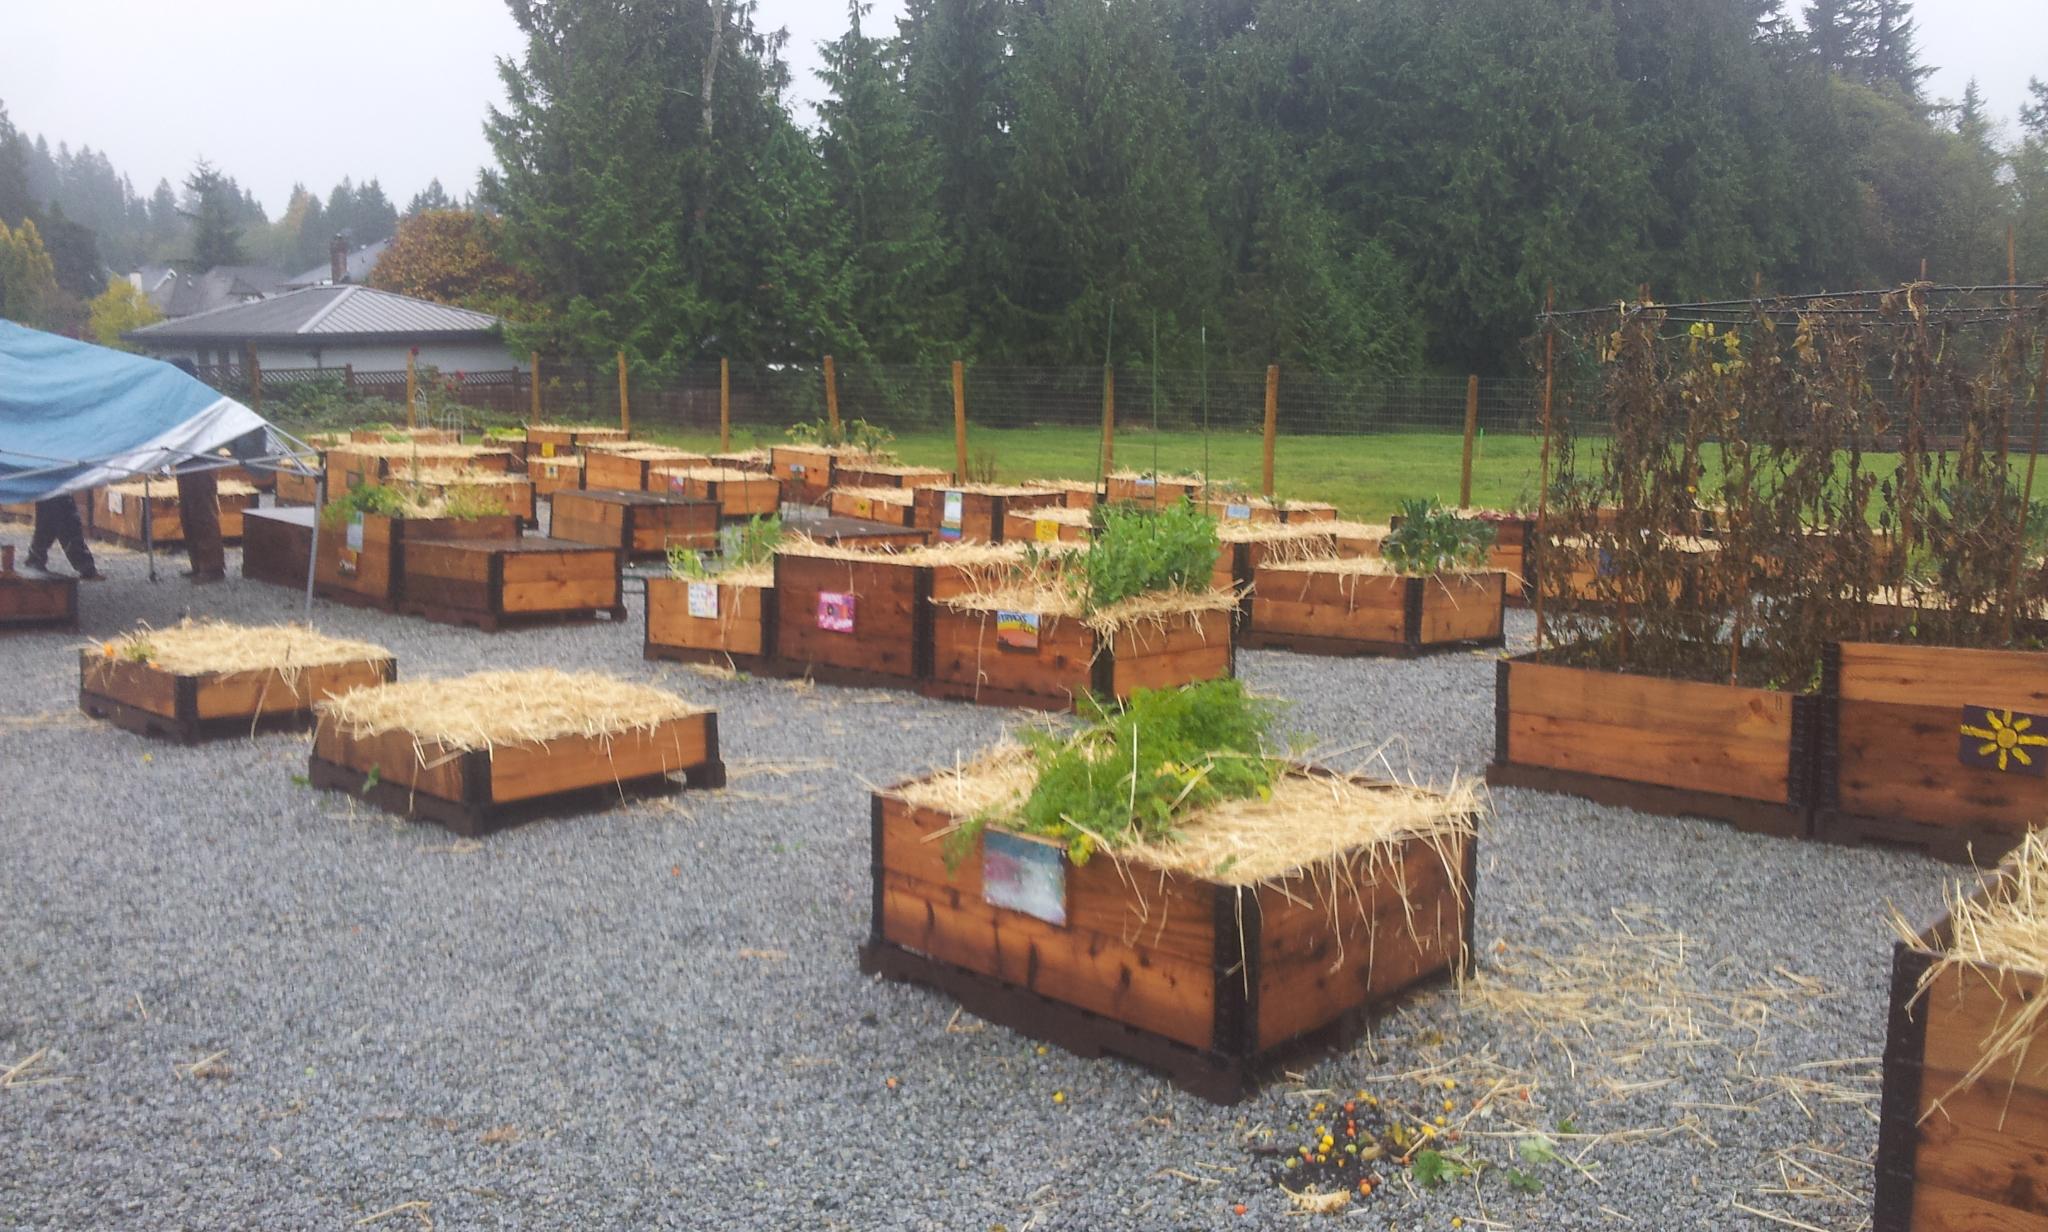 burke-mountain-temporary-community-garden-closing-112013_11244625956_o.jpg